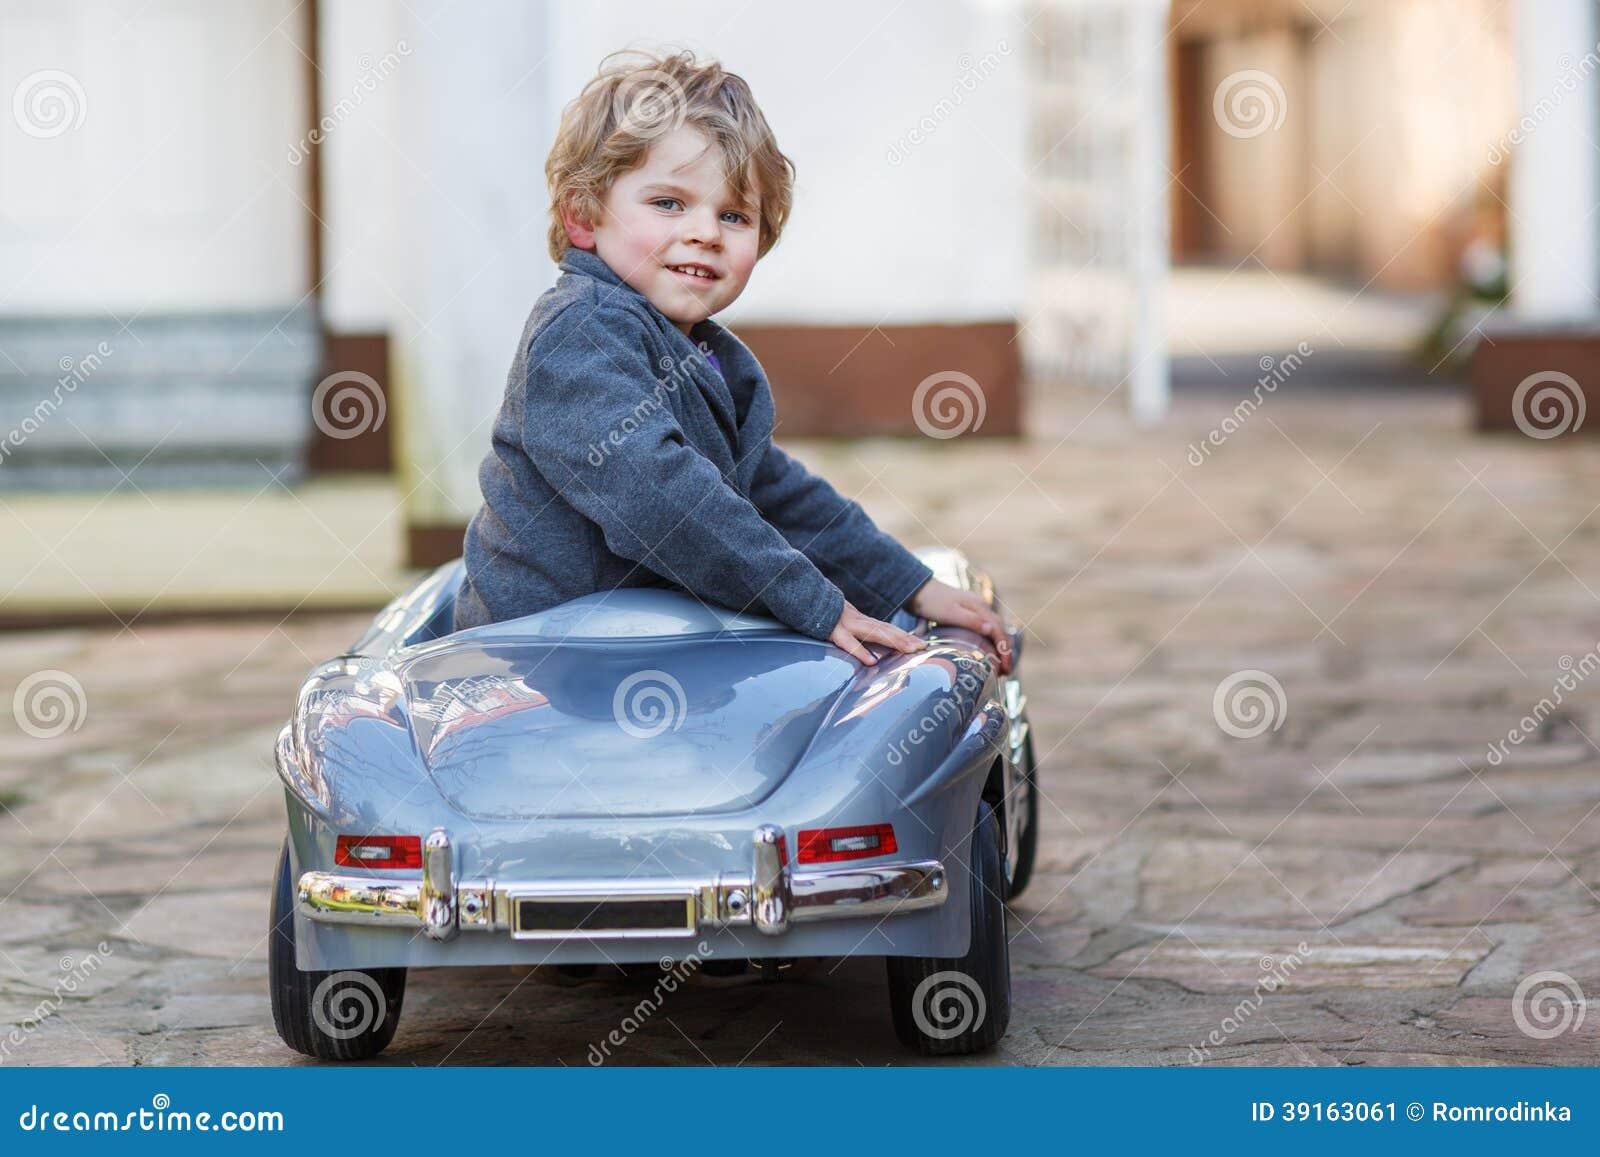 Little Big Boys Toys : Little boy driving big toy car outdoors